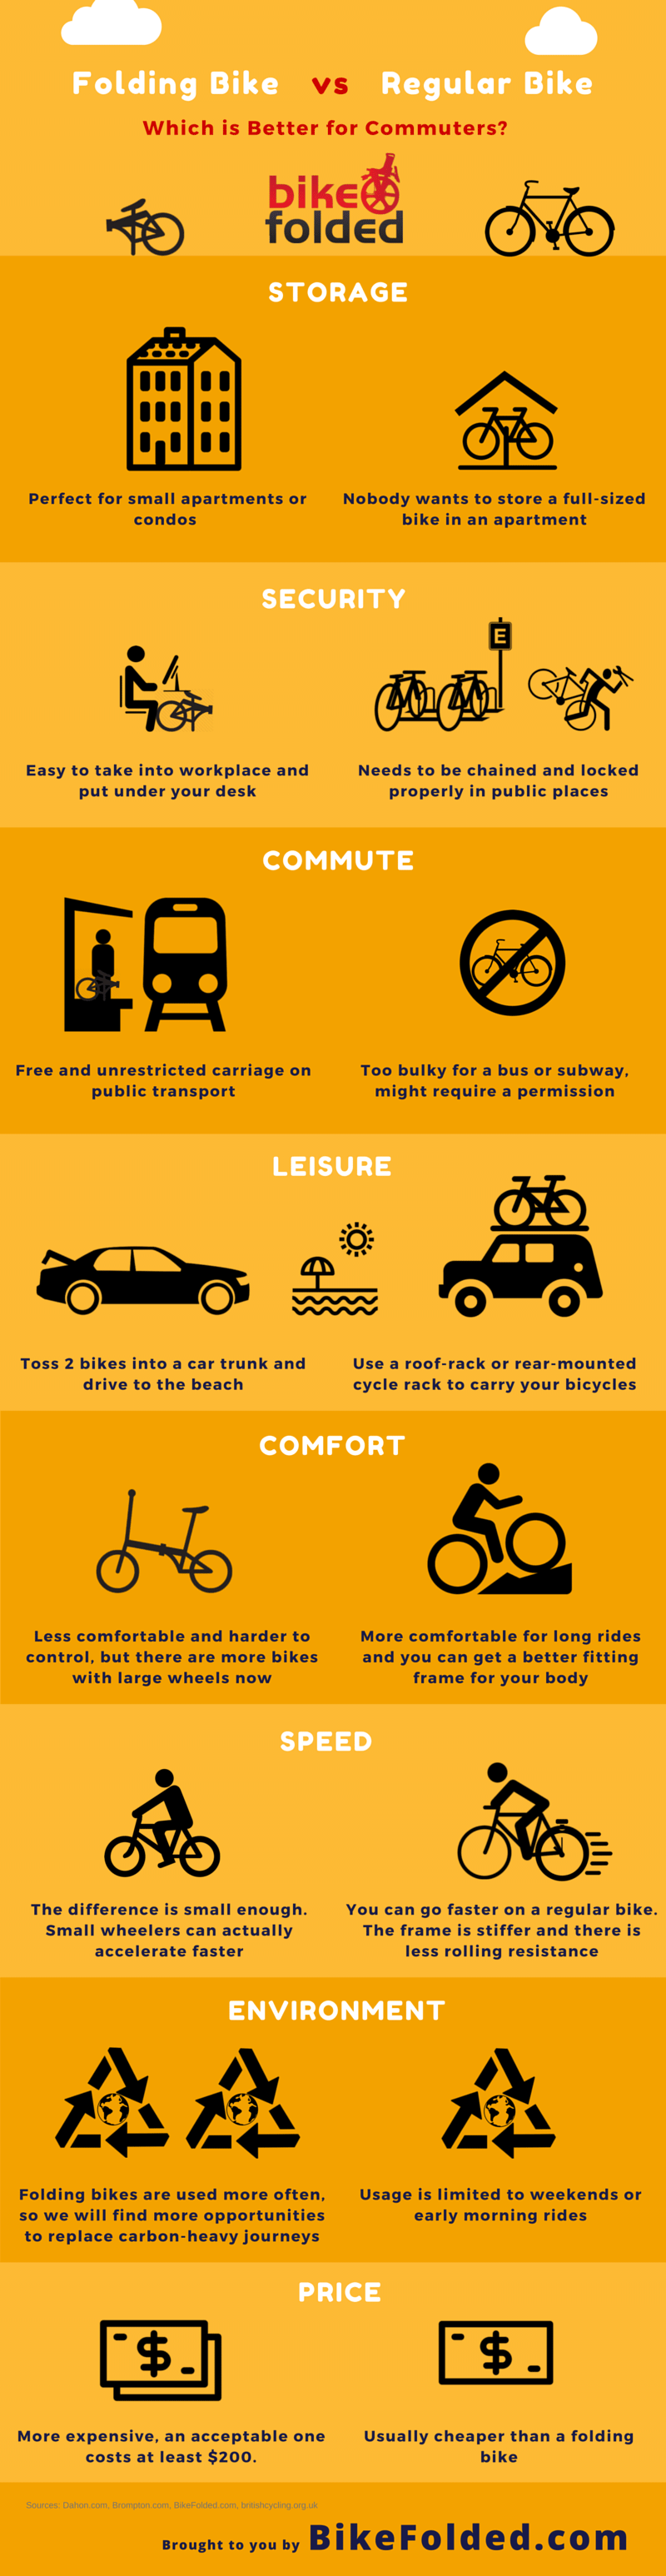 folding-bike-infographic